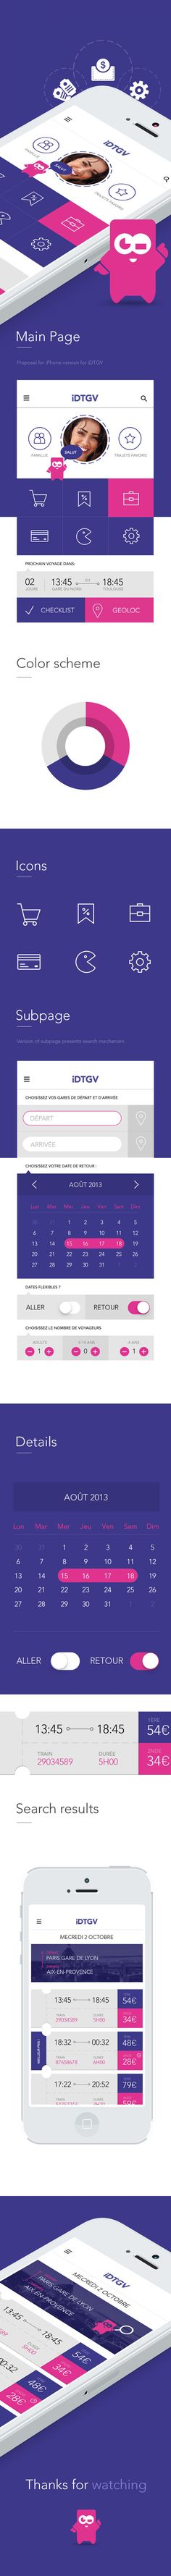 iOS7 Proposal iDTGV on Behance